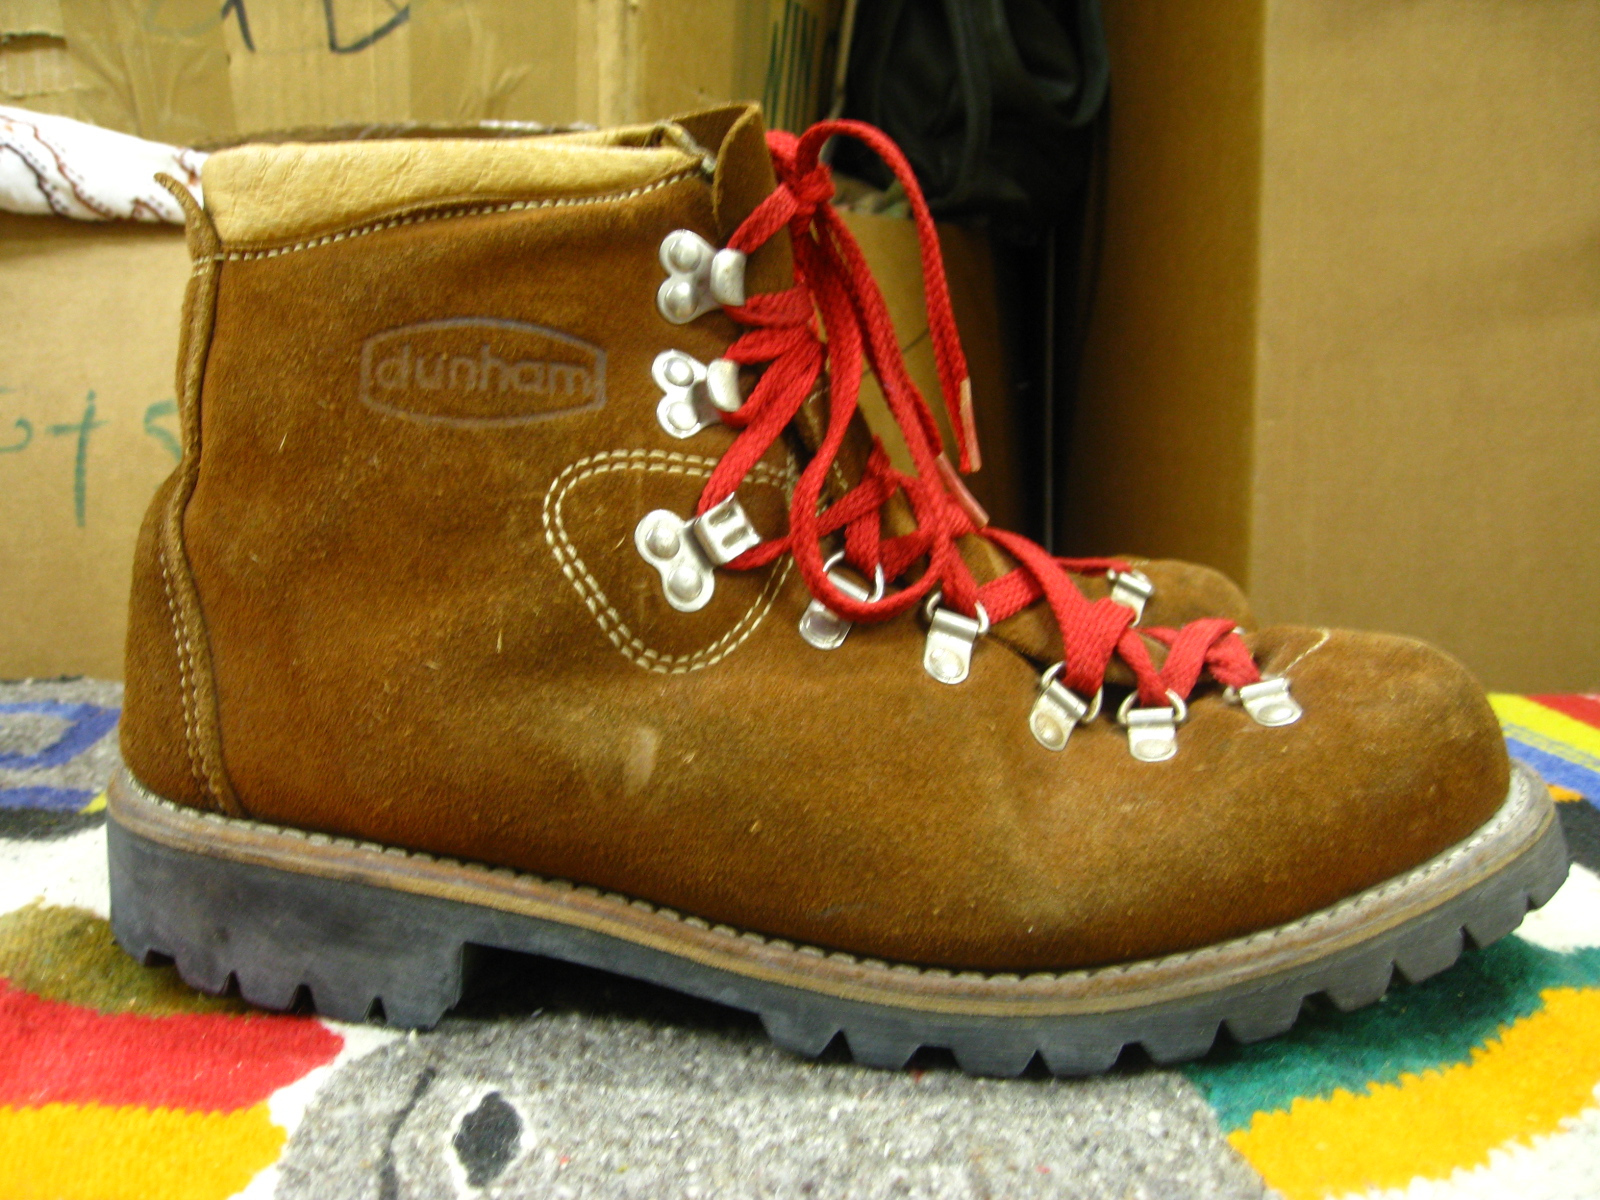 VIntage Dunham Hiking Boots   No